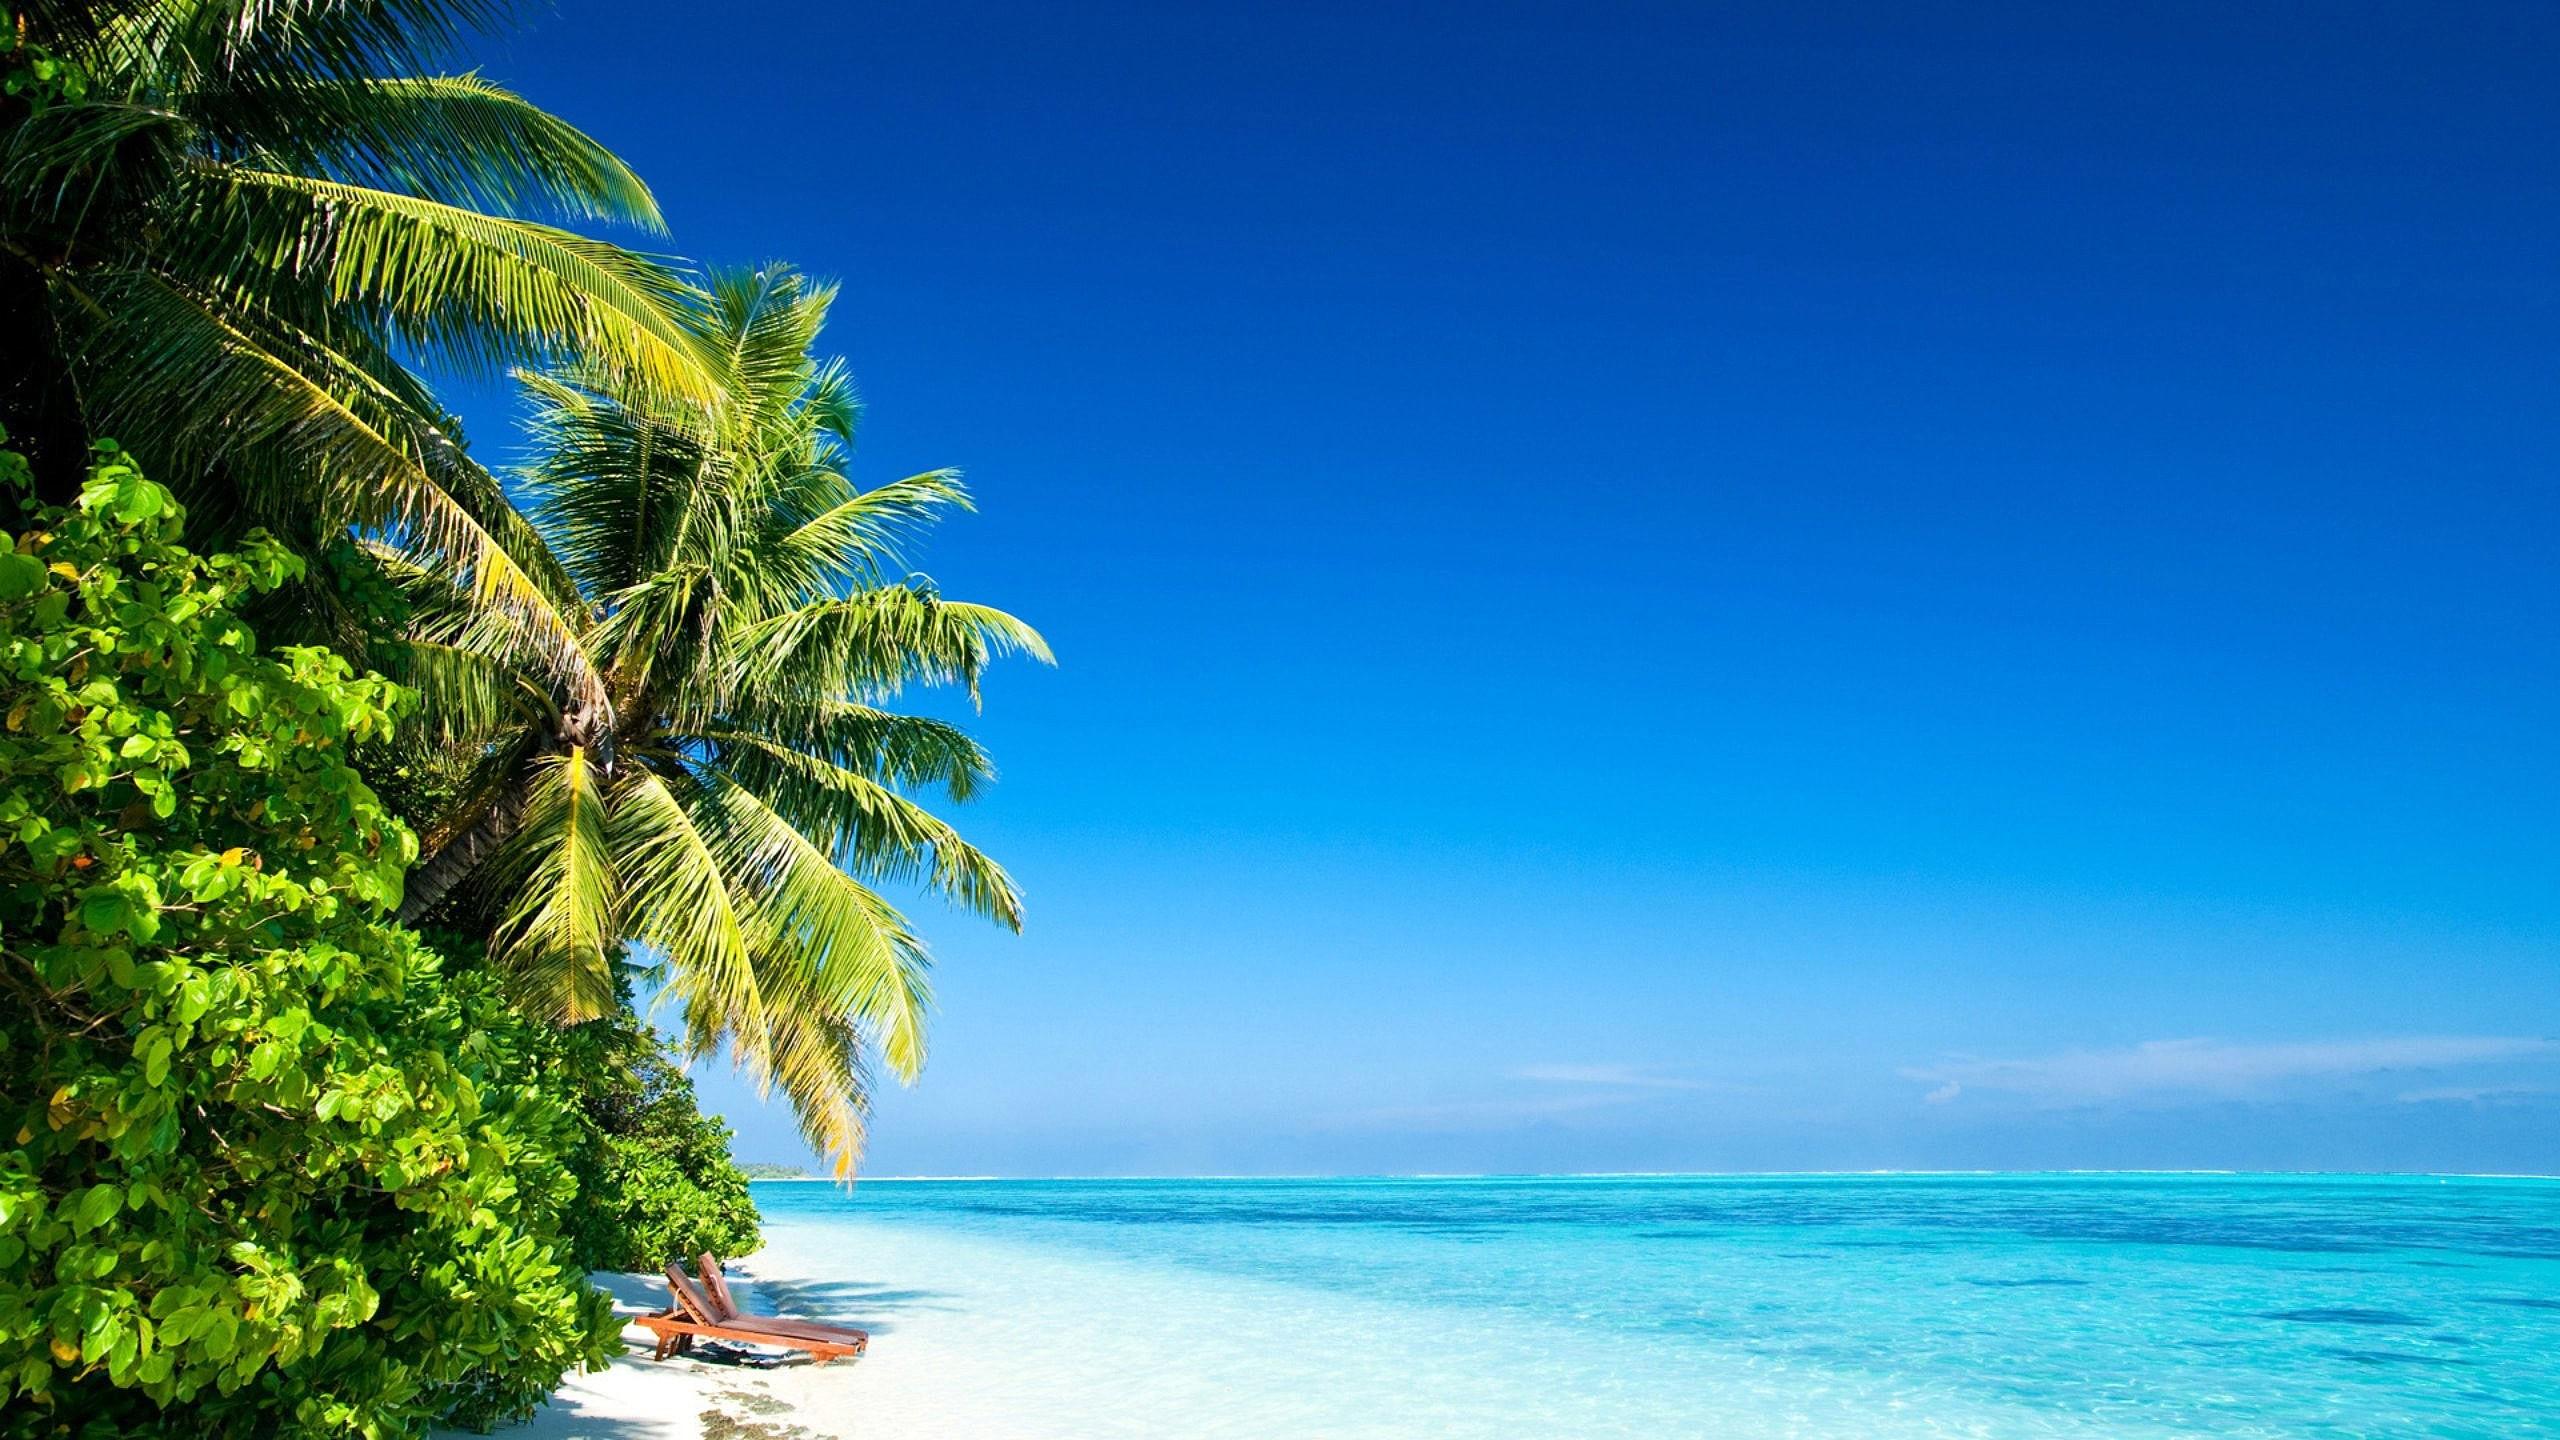 Most Inspiring Wallpaper Macbook Tropical - tropical-ocean-wallpaper-2560x1440-361  2018_406024.jpg